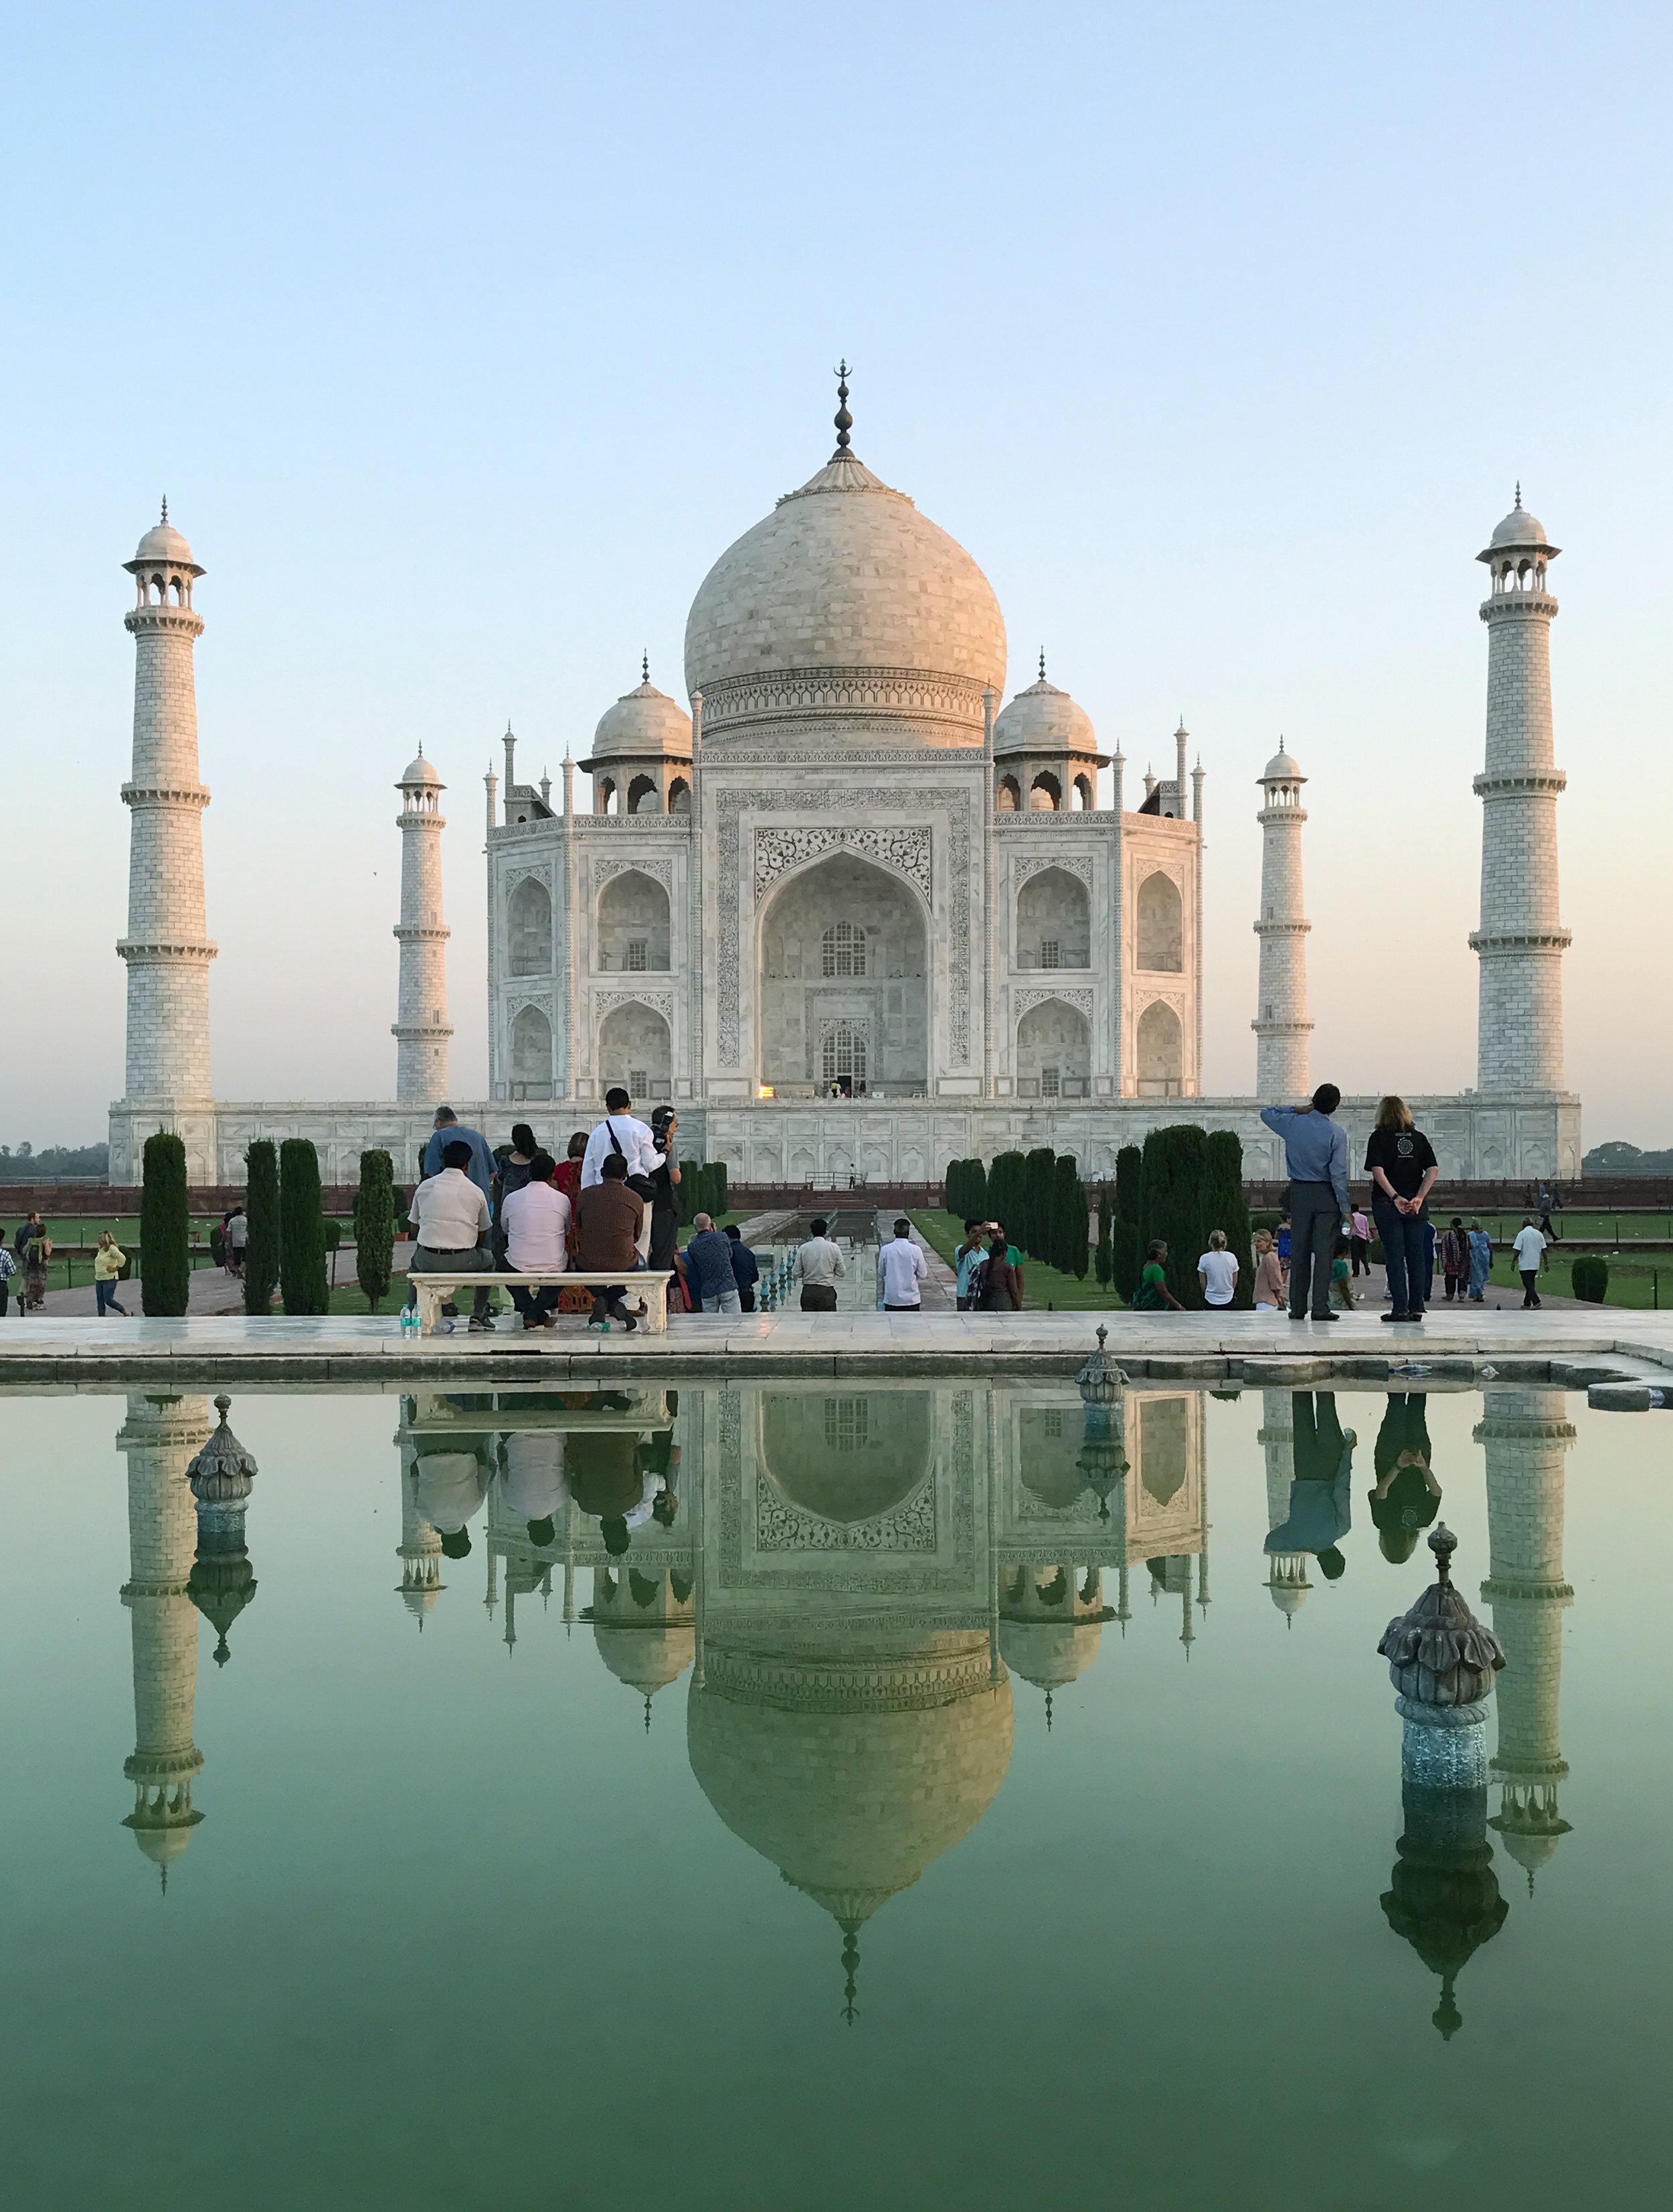 Here it is, the breathtaking Taj Mahal!